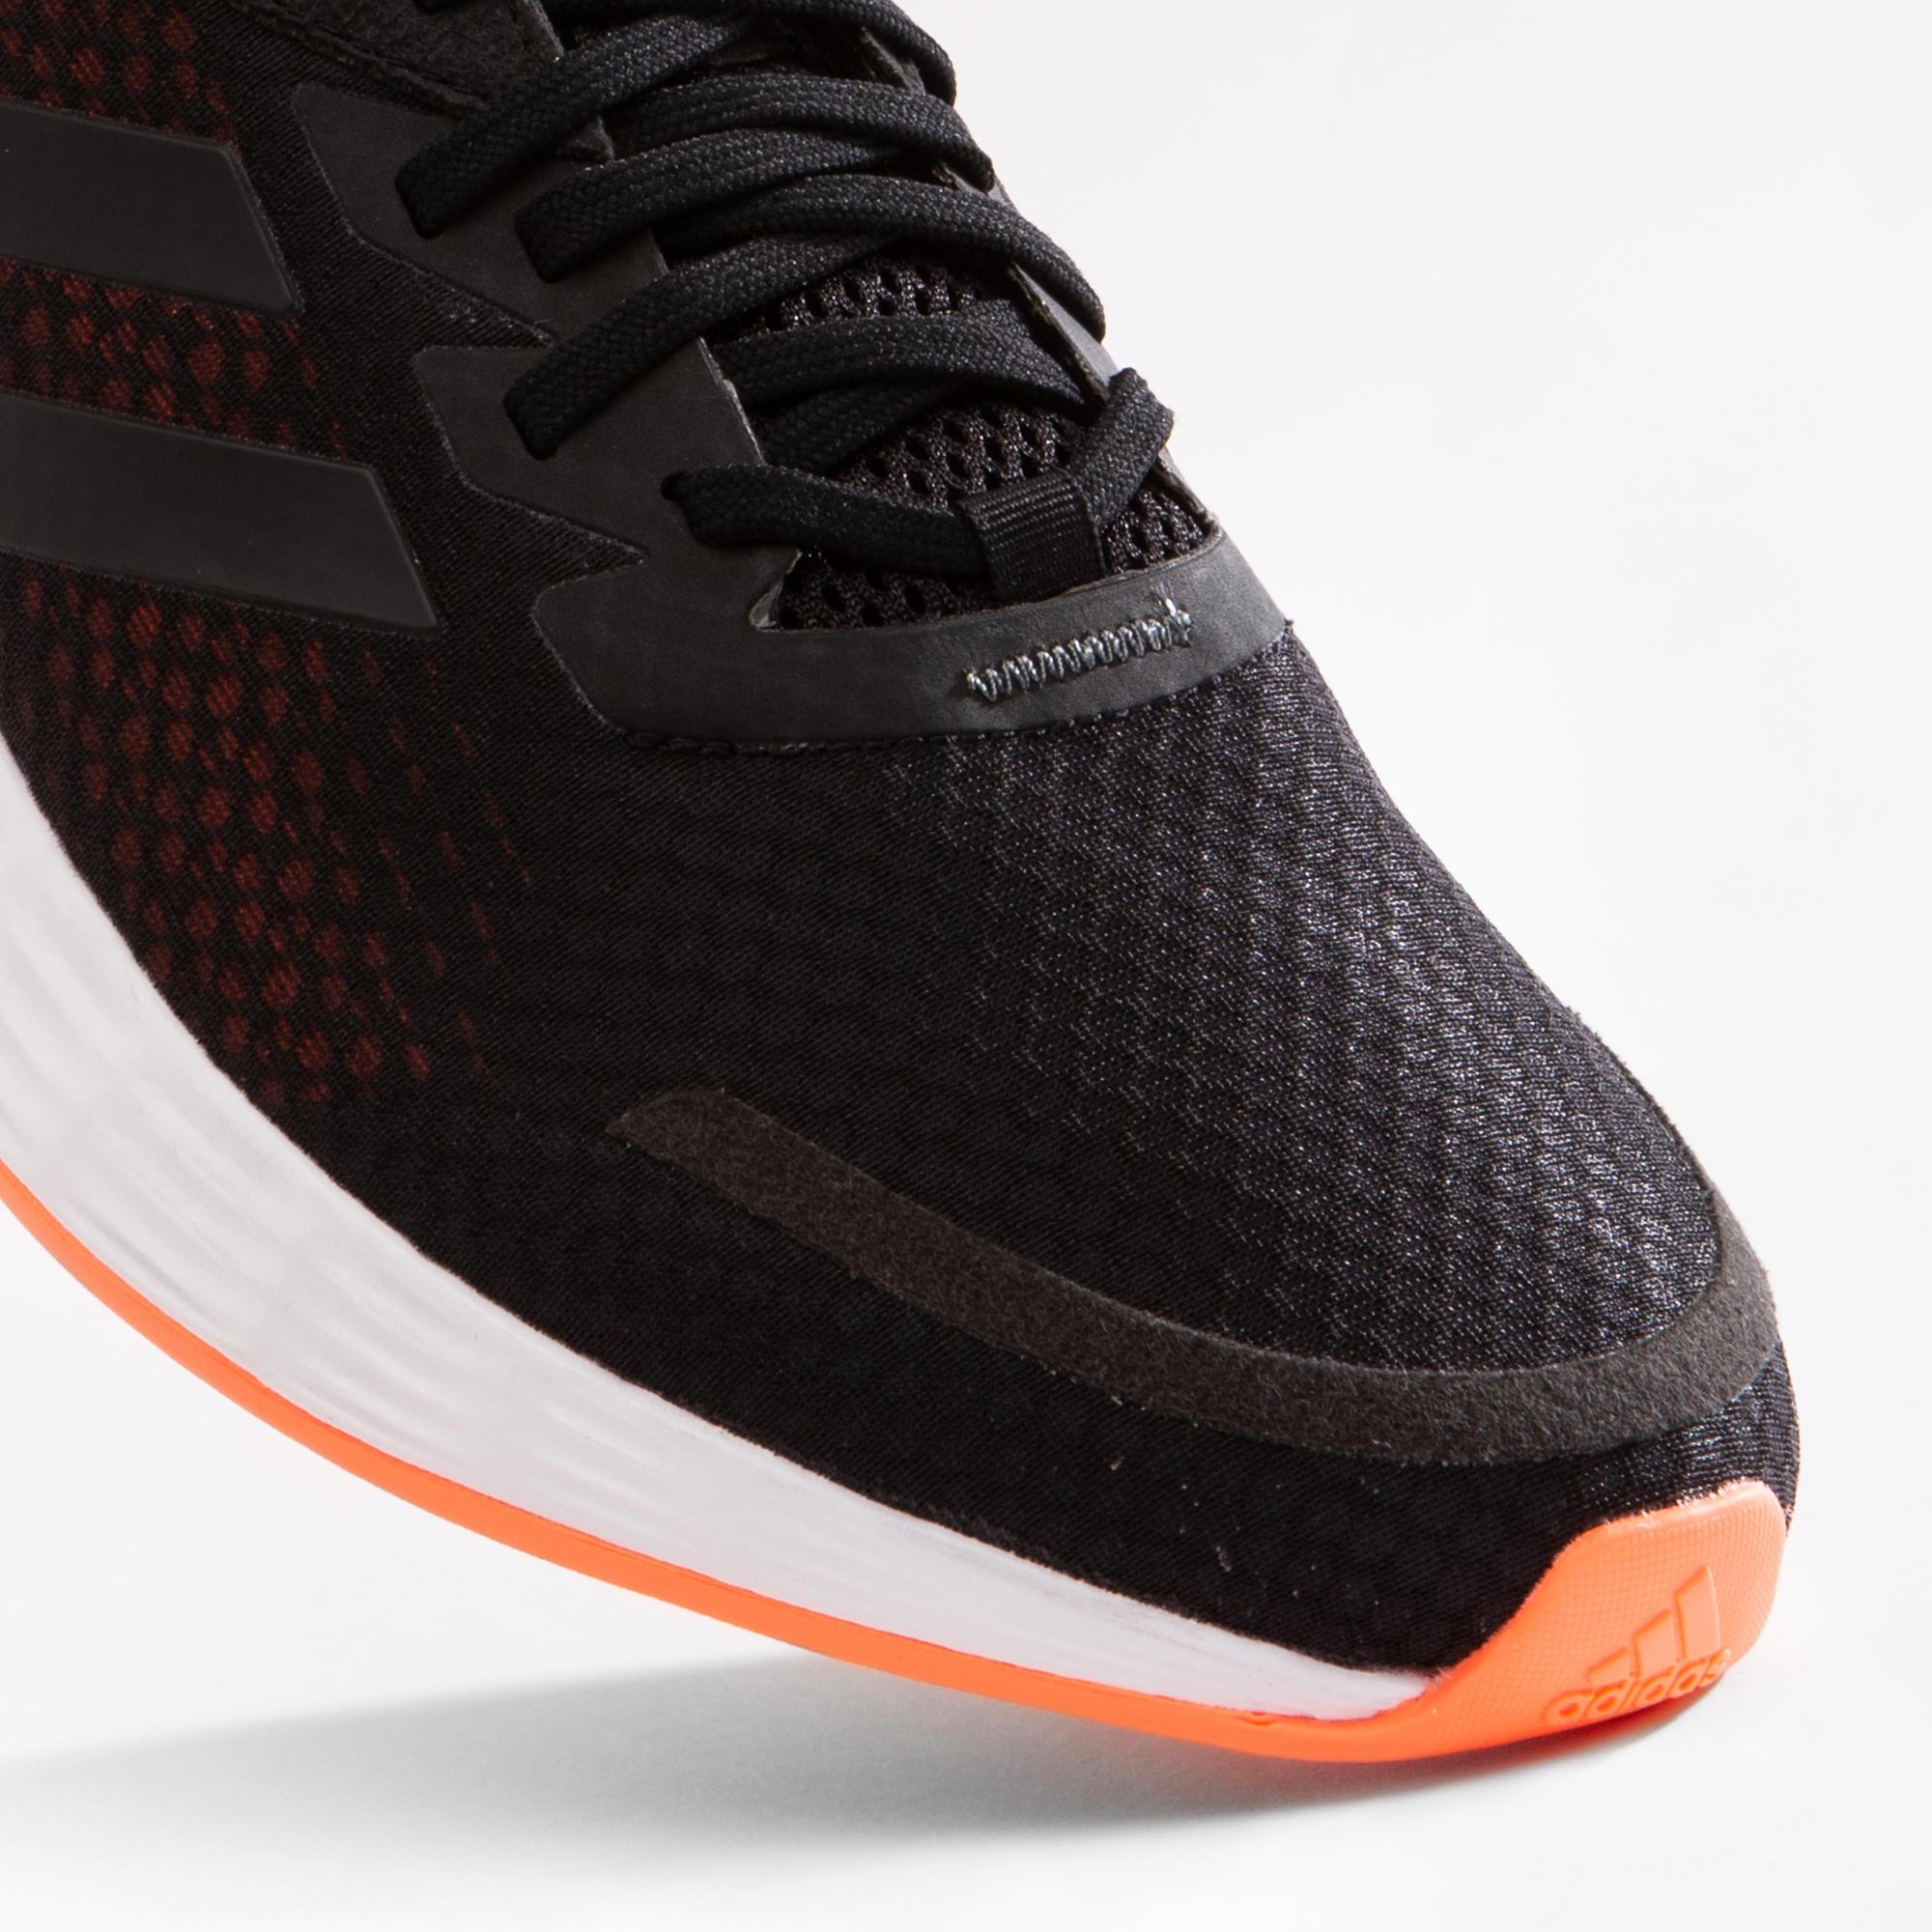 Chaussures de Running homme ADIDAS DURAMO noir ADIDAS   Decathlon